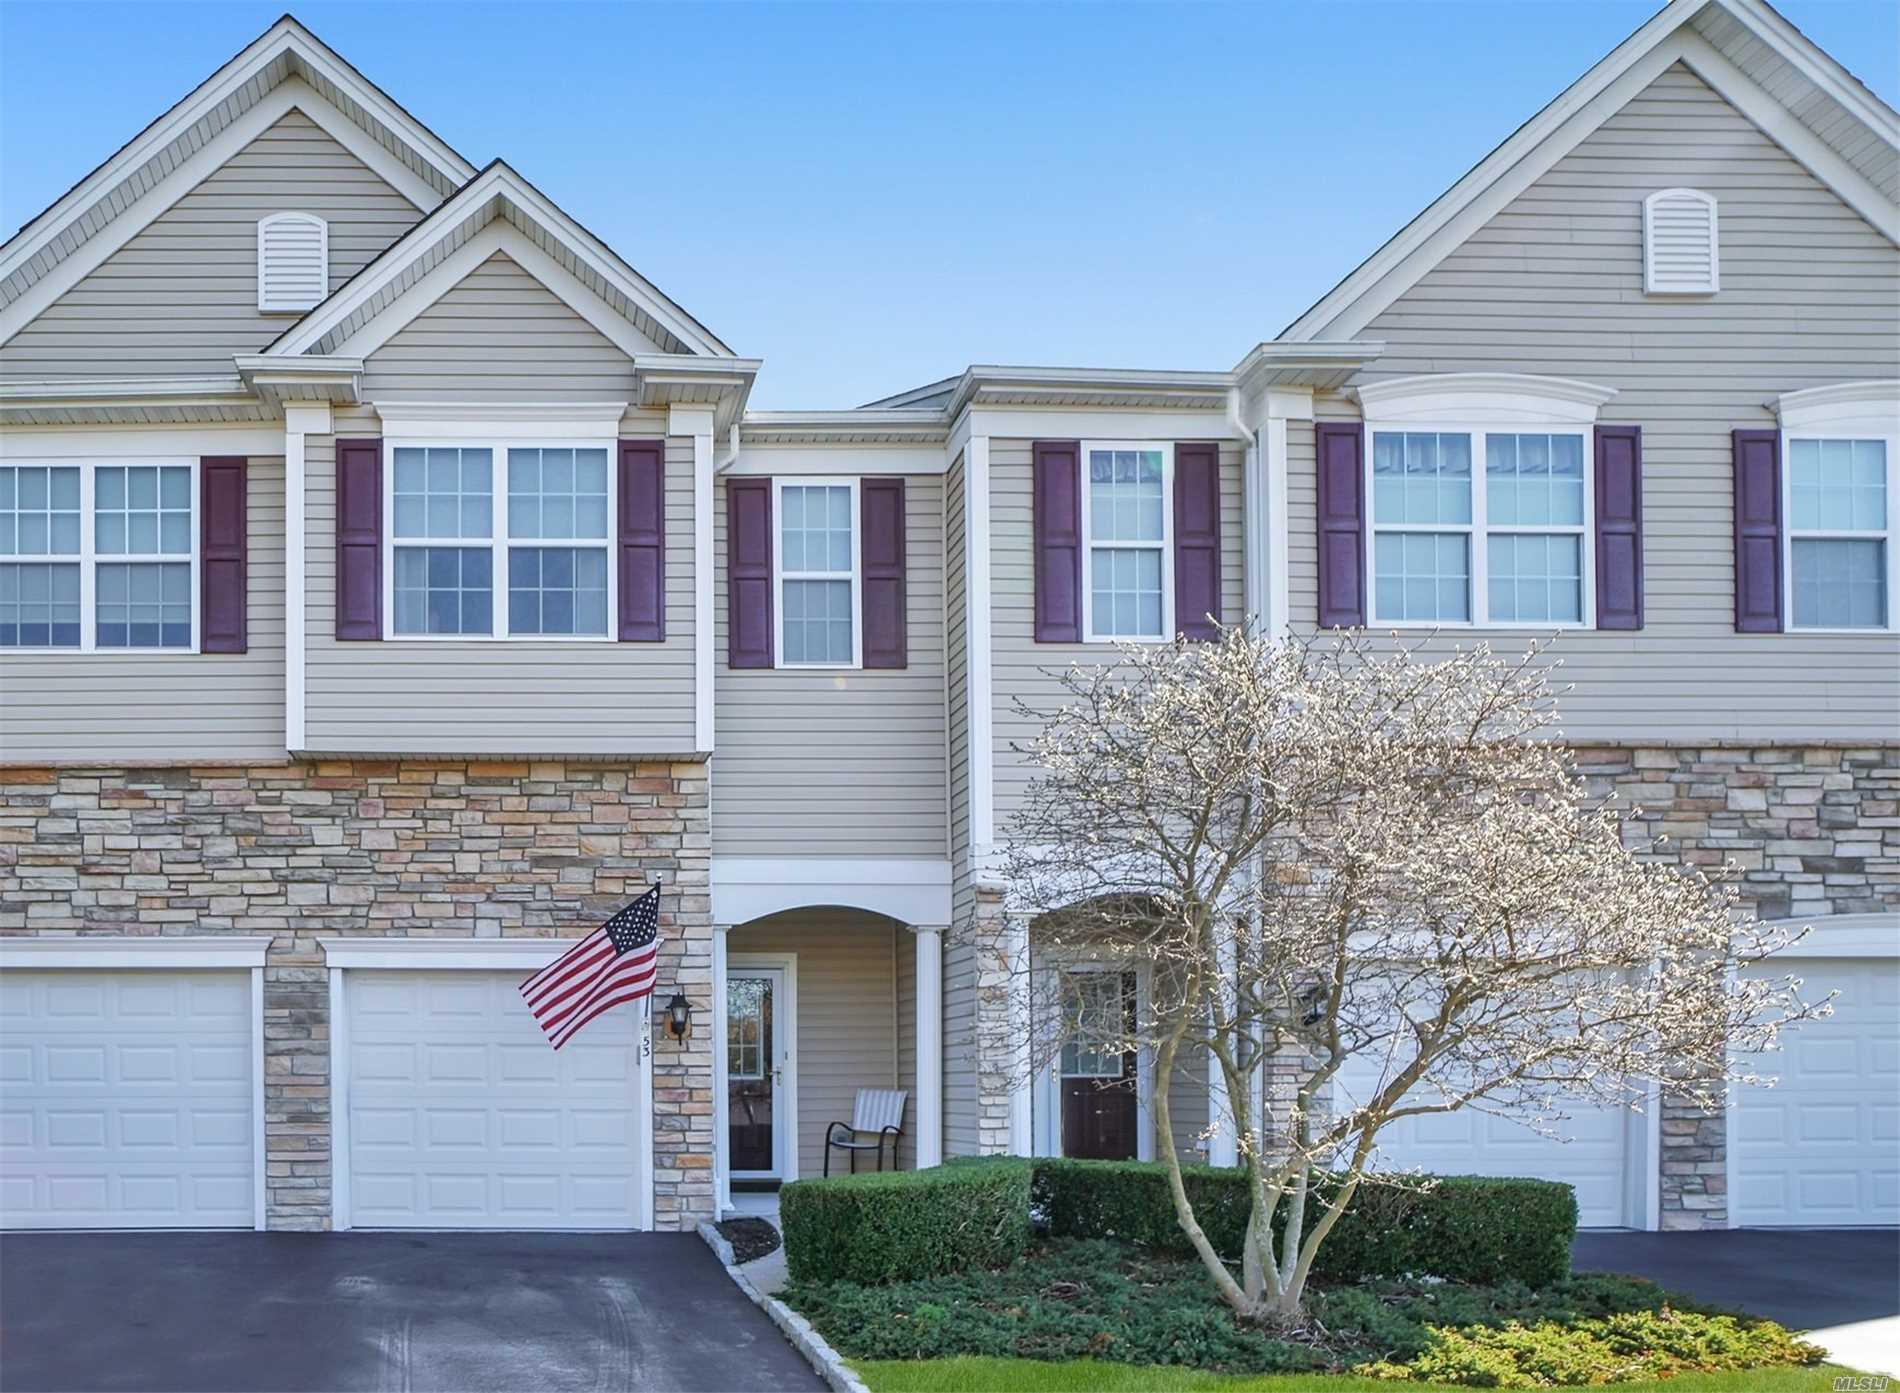 Property for sale at 53 Torrey Pine Lane, Bay Shore NY 11706, Bay Shore,  New York 11706